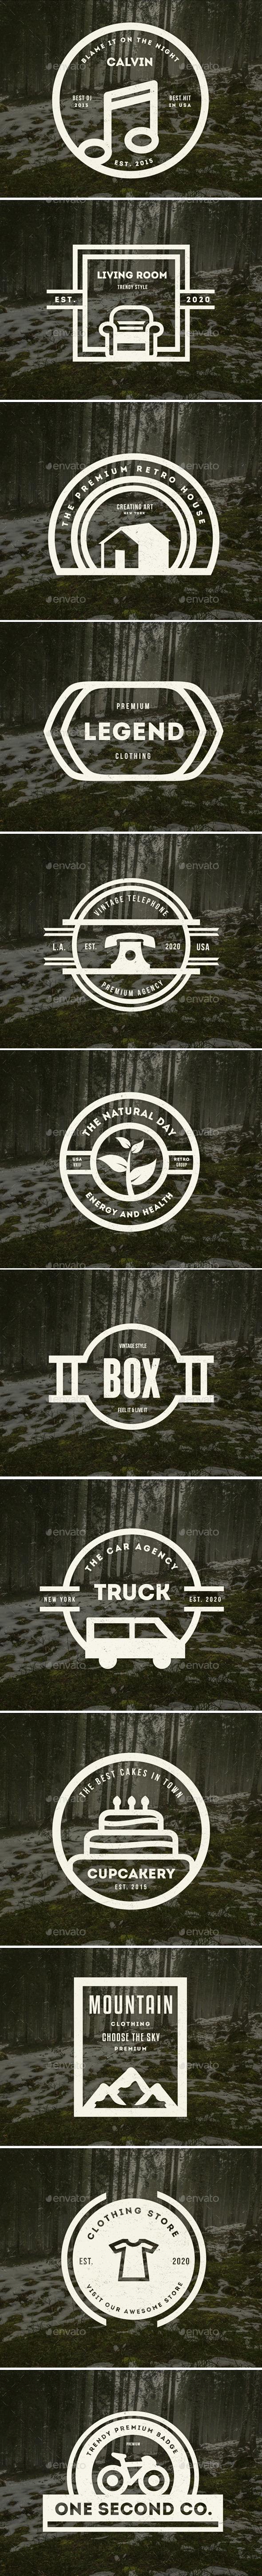 12 Vintage Logos Labels & Badges - Badges & Stickers Web Elements